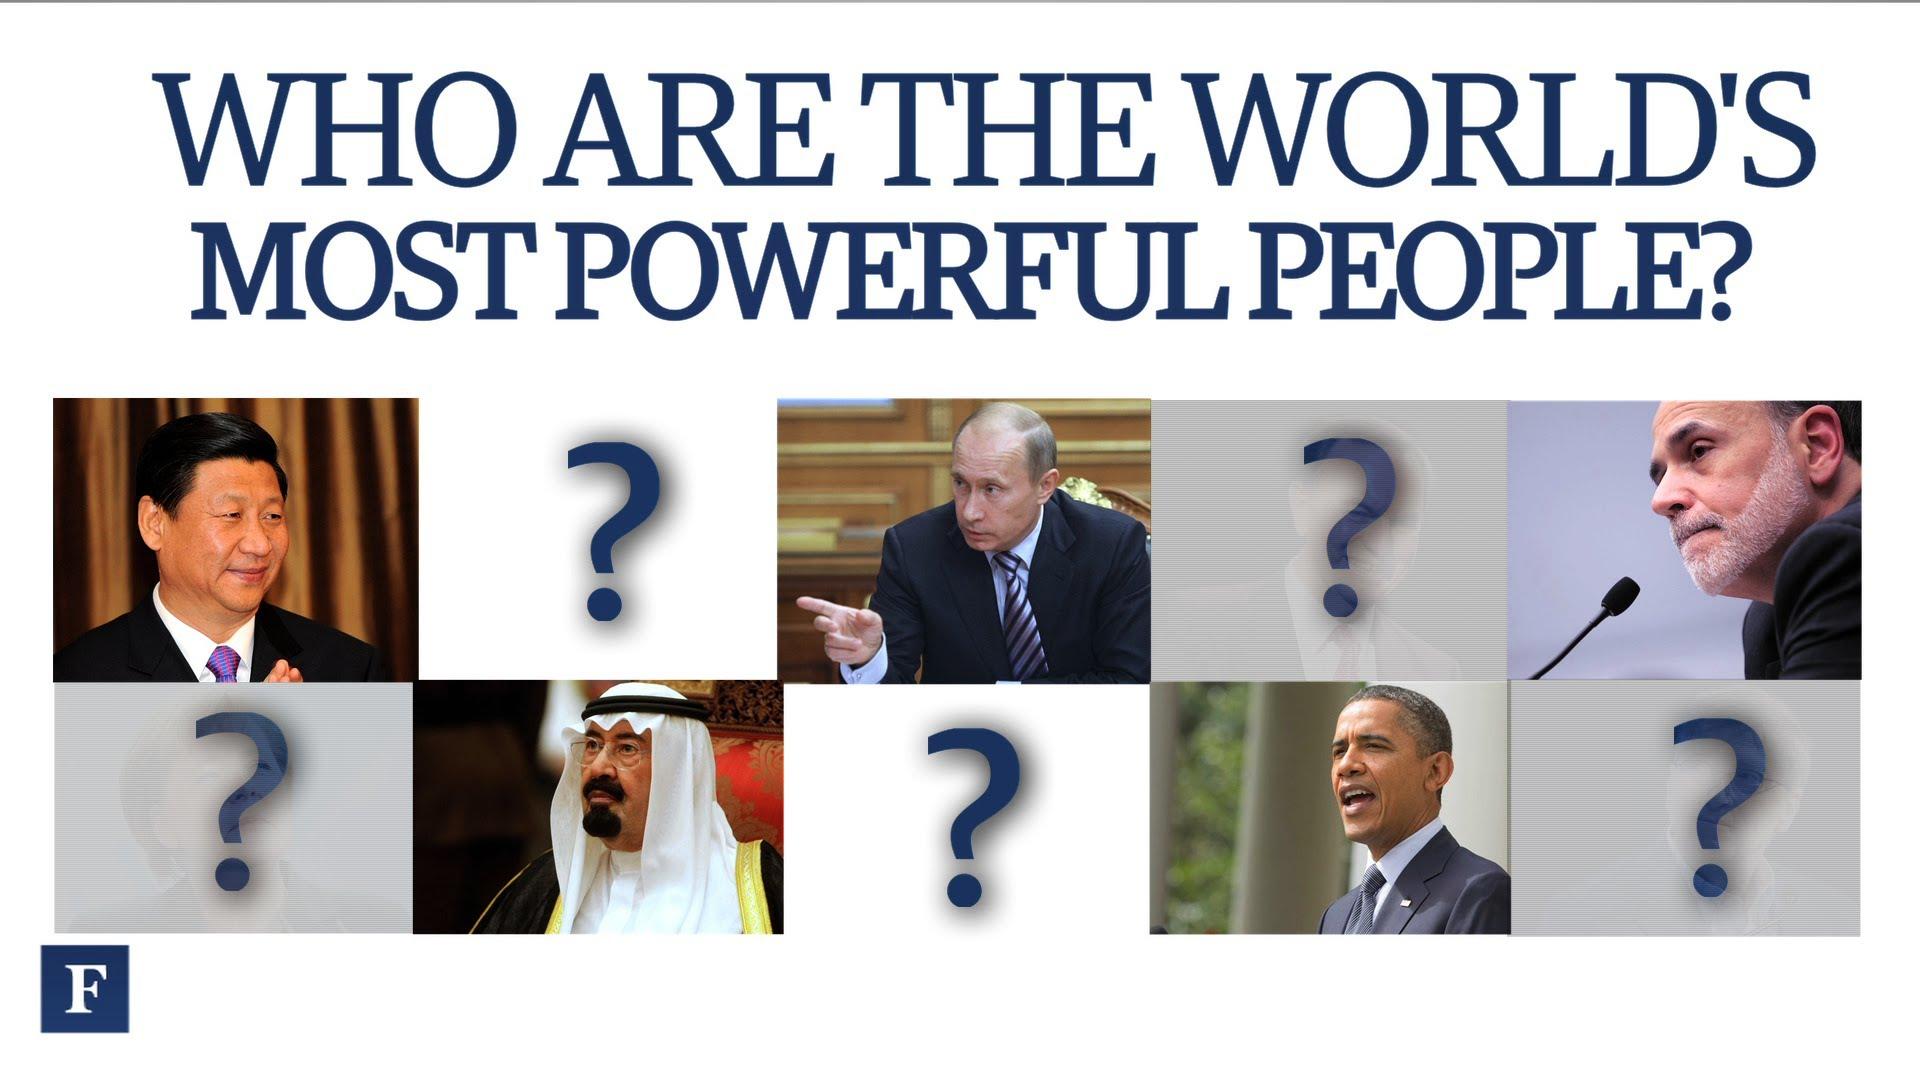 Powerful People